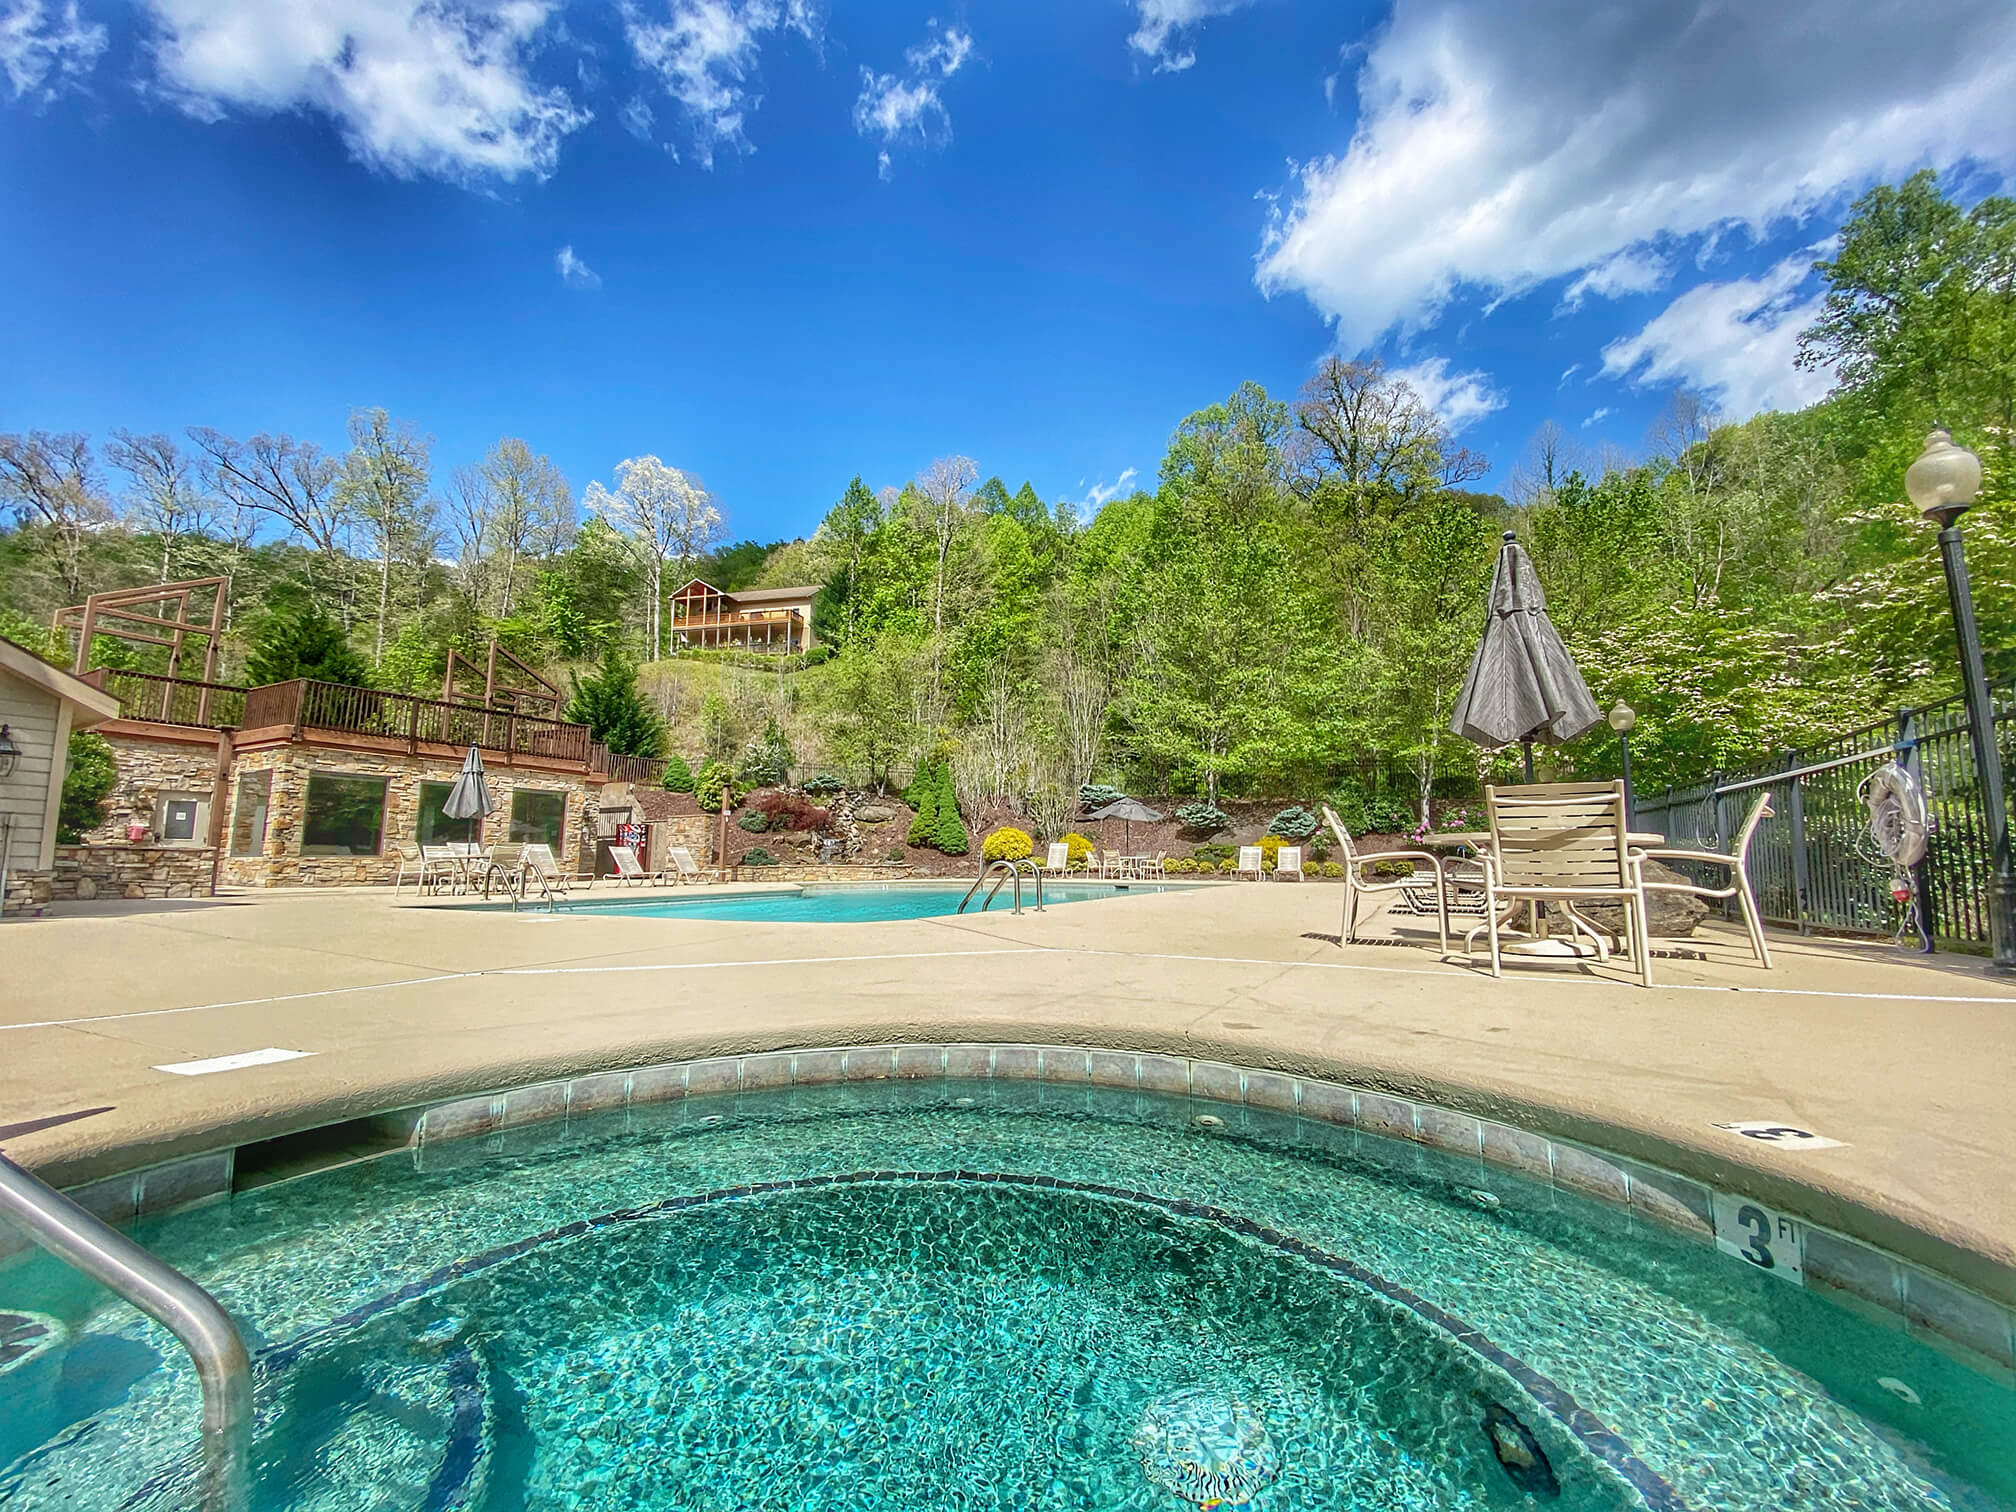 Smoky Mountain Country Club Spa